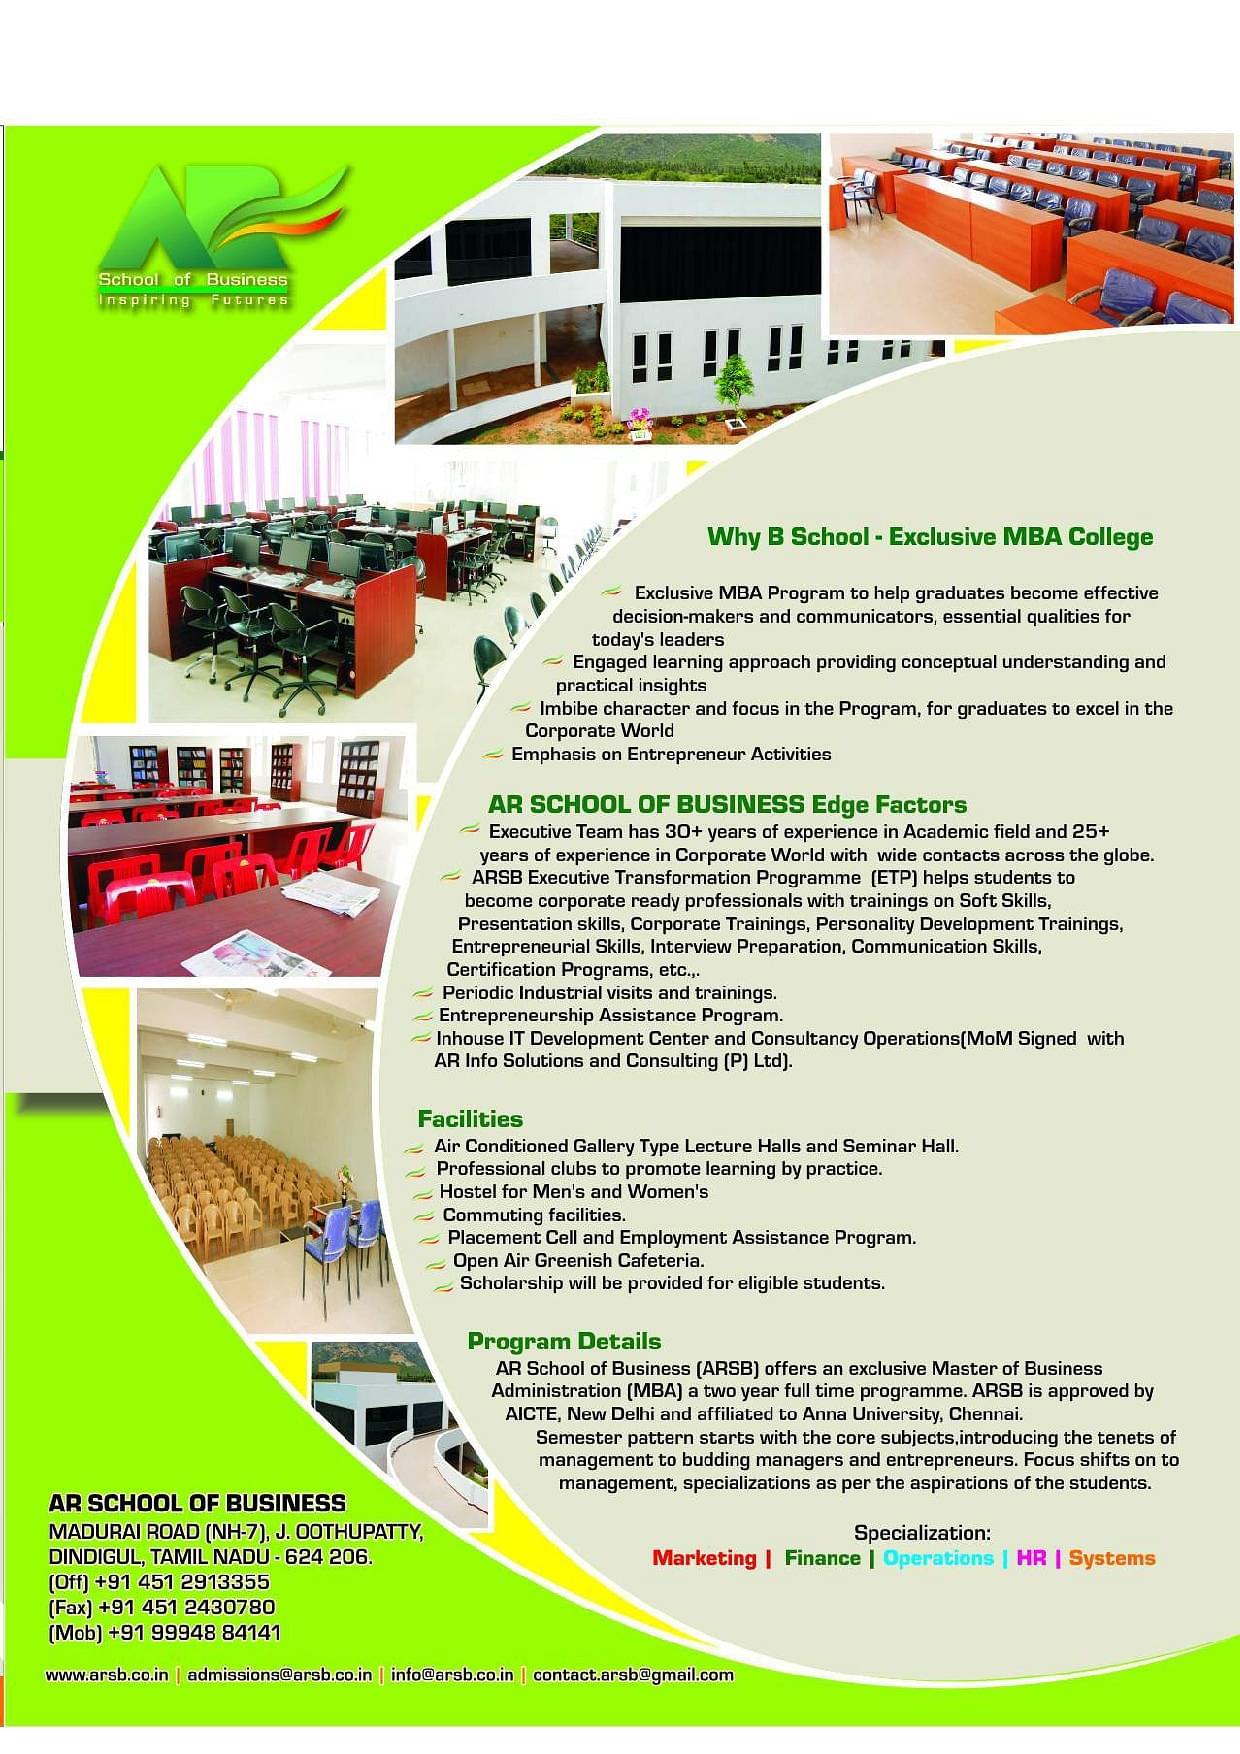 agni siragugal in tamil pdf free download